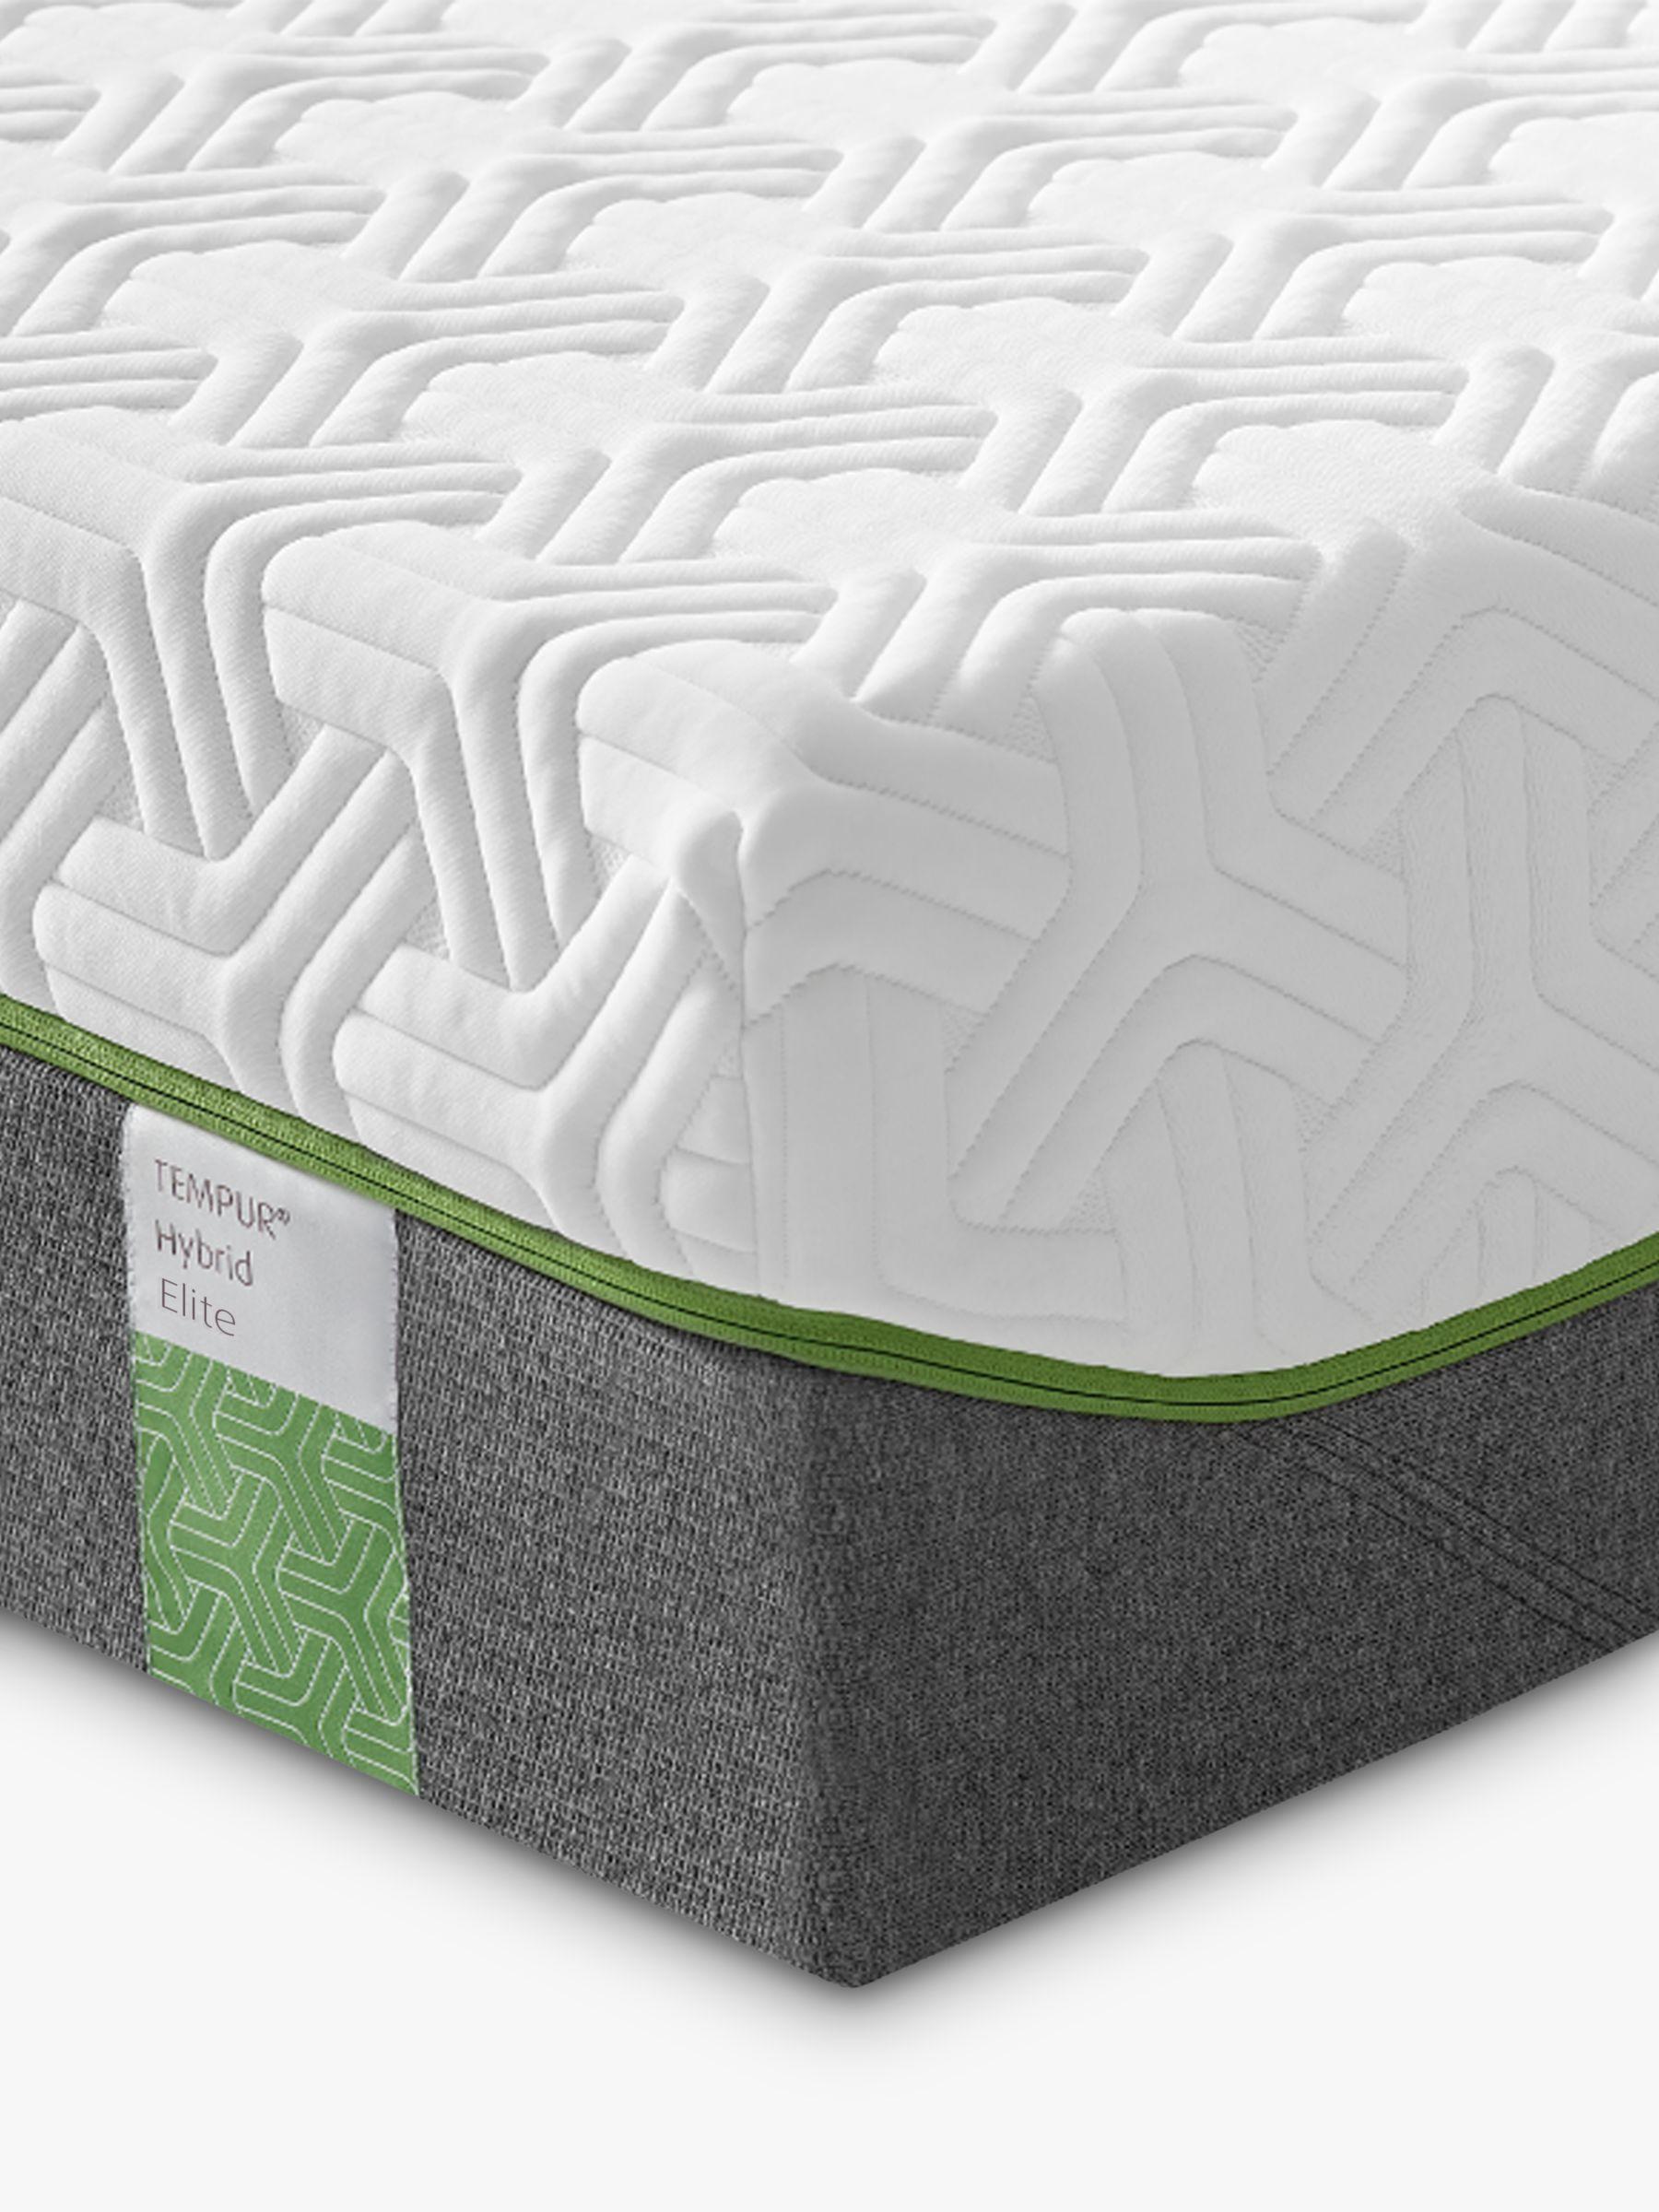 Tempur Tempur Hybrid Elite Pocket Spring Memory Foam Mattress, Single